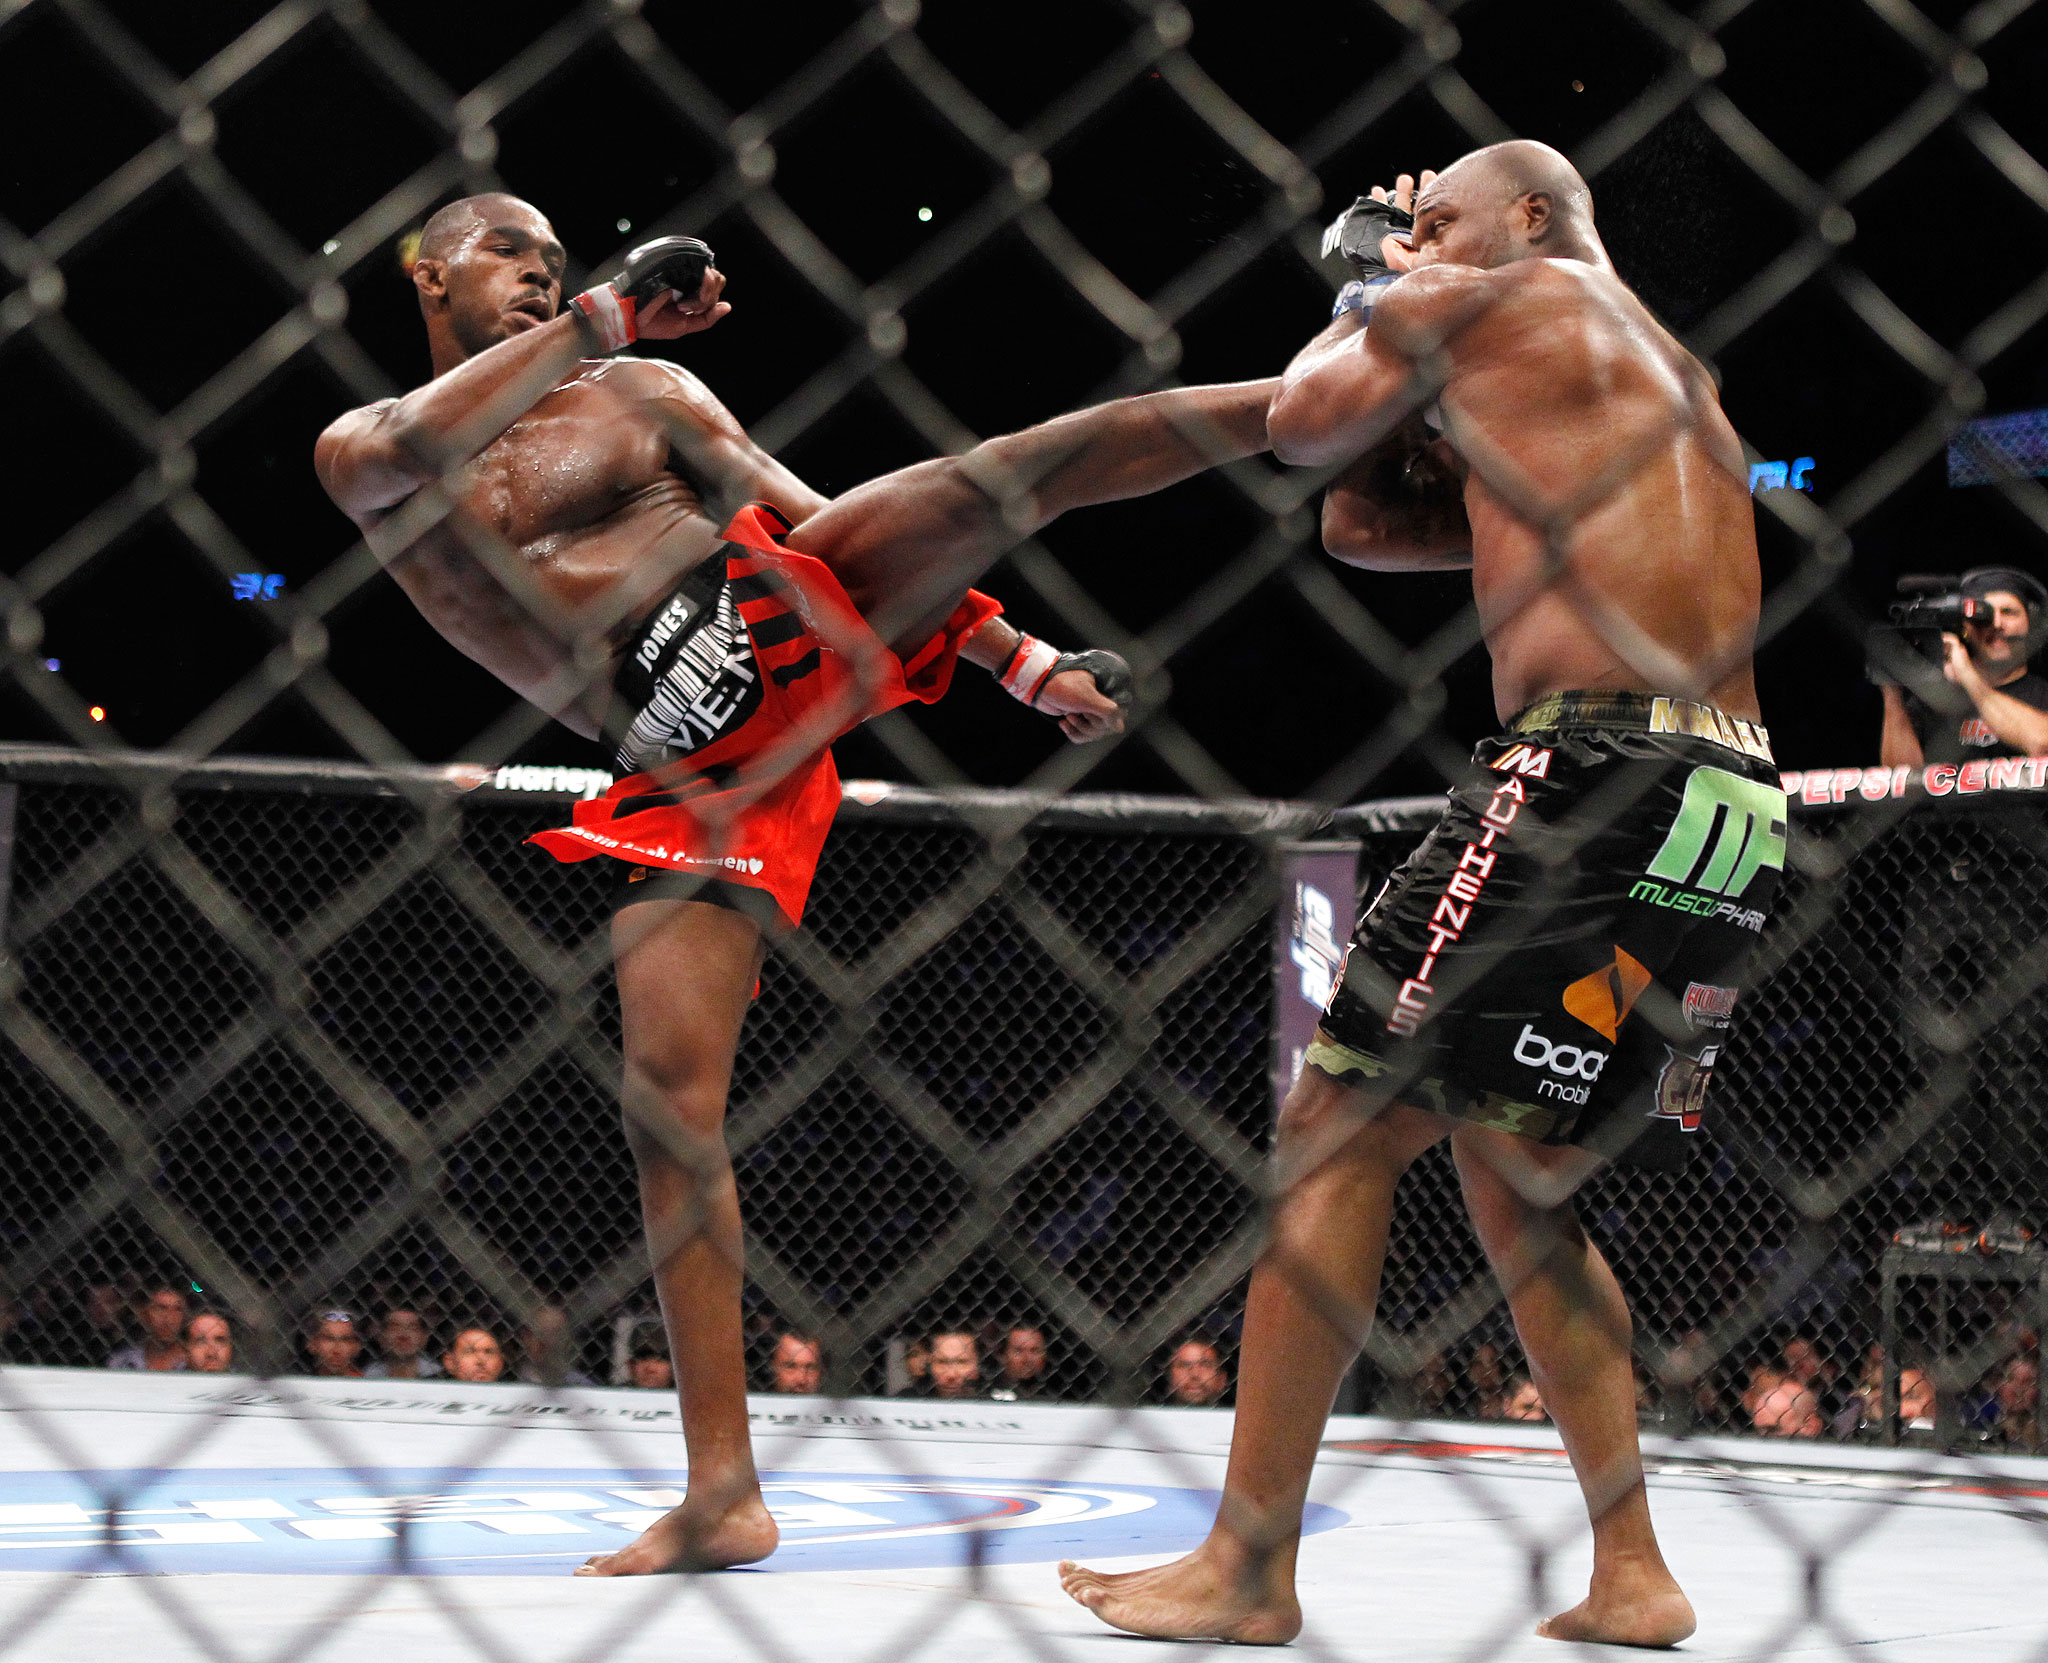 No. 3 -- 'Rampage' Jackson: UFC 135